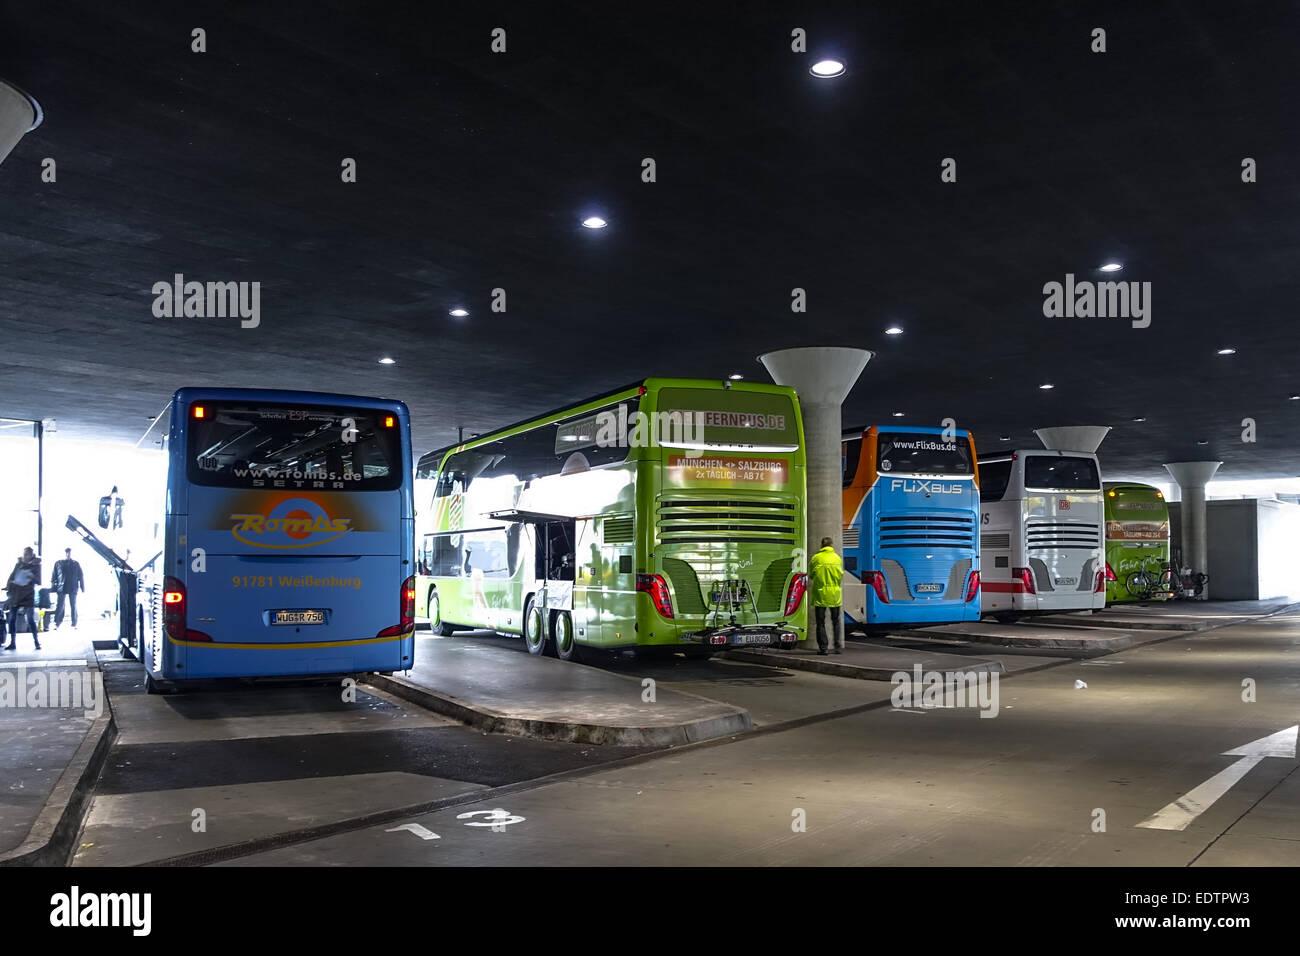 zentraler omnibusbahnhof zob m nchen oberbayern bayern stock photo 77376799 alamy. Black Bedroom Furniture Sets. Home Design Ideas